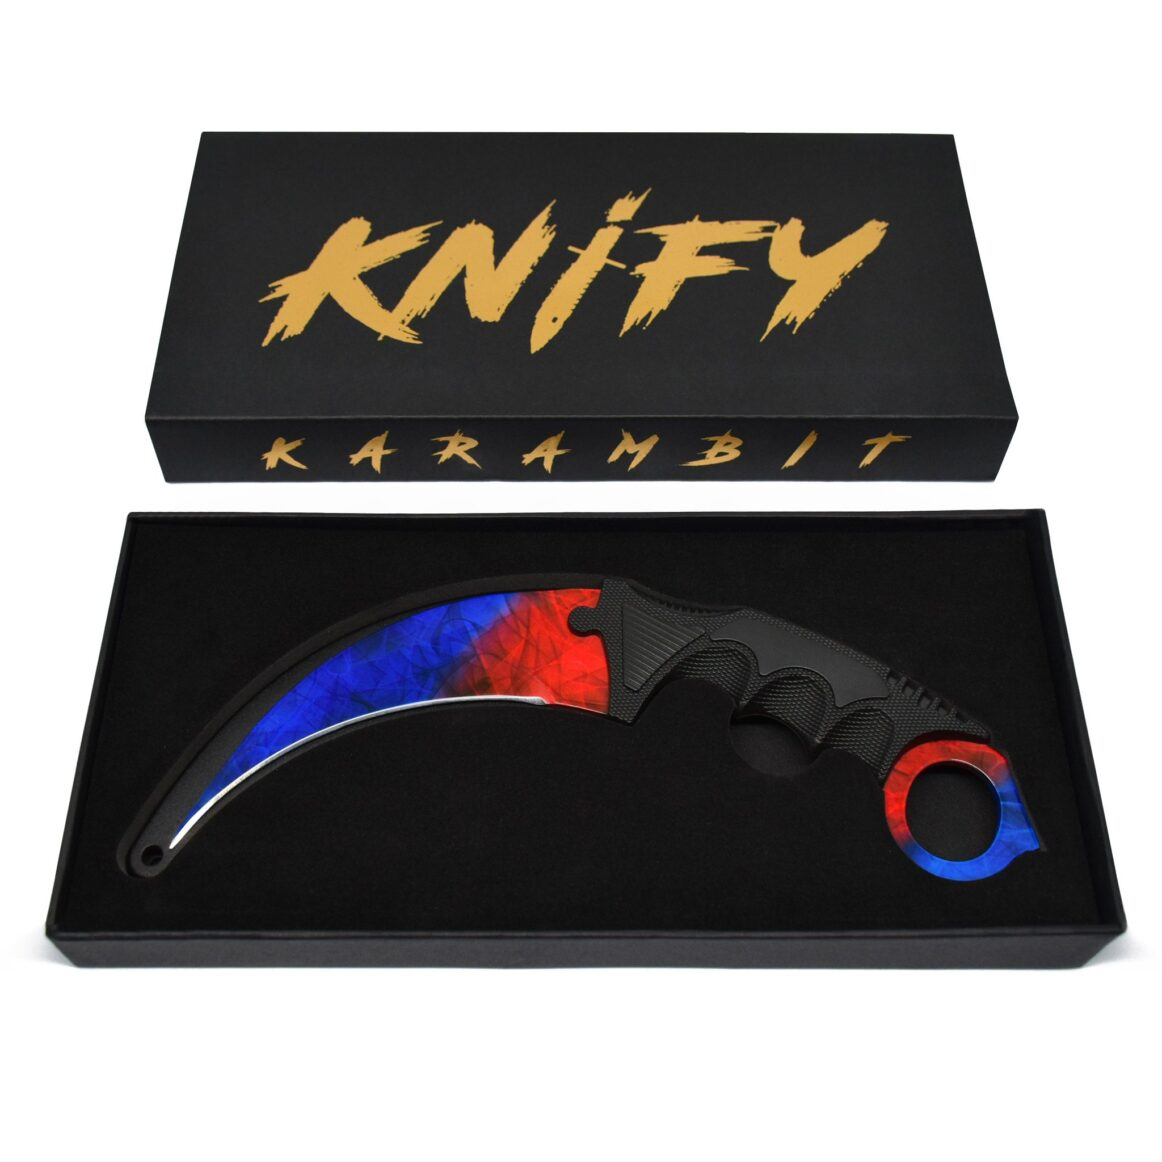 Couteau CS:GO IRL Karambit Marble Fade - Vrai Couteau Karambit Marbre Fondu